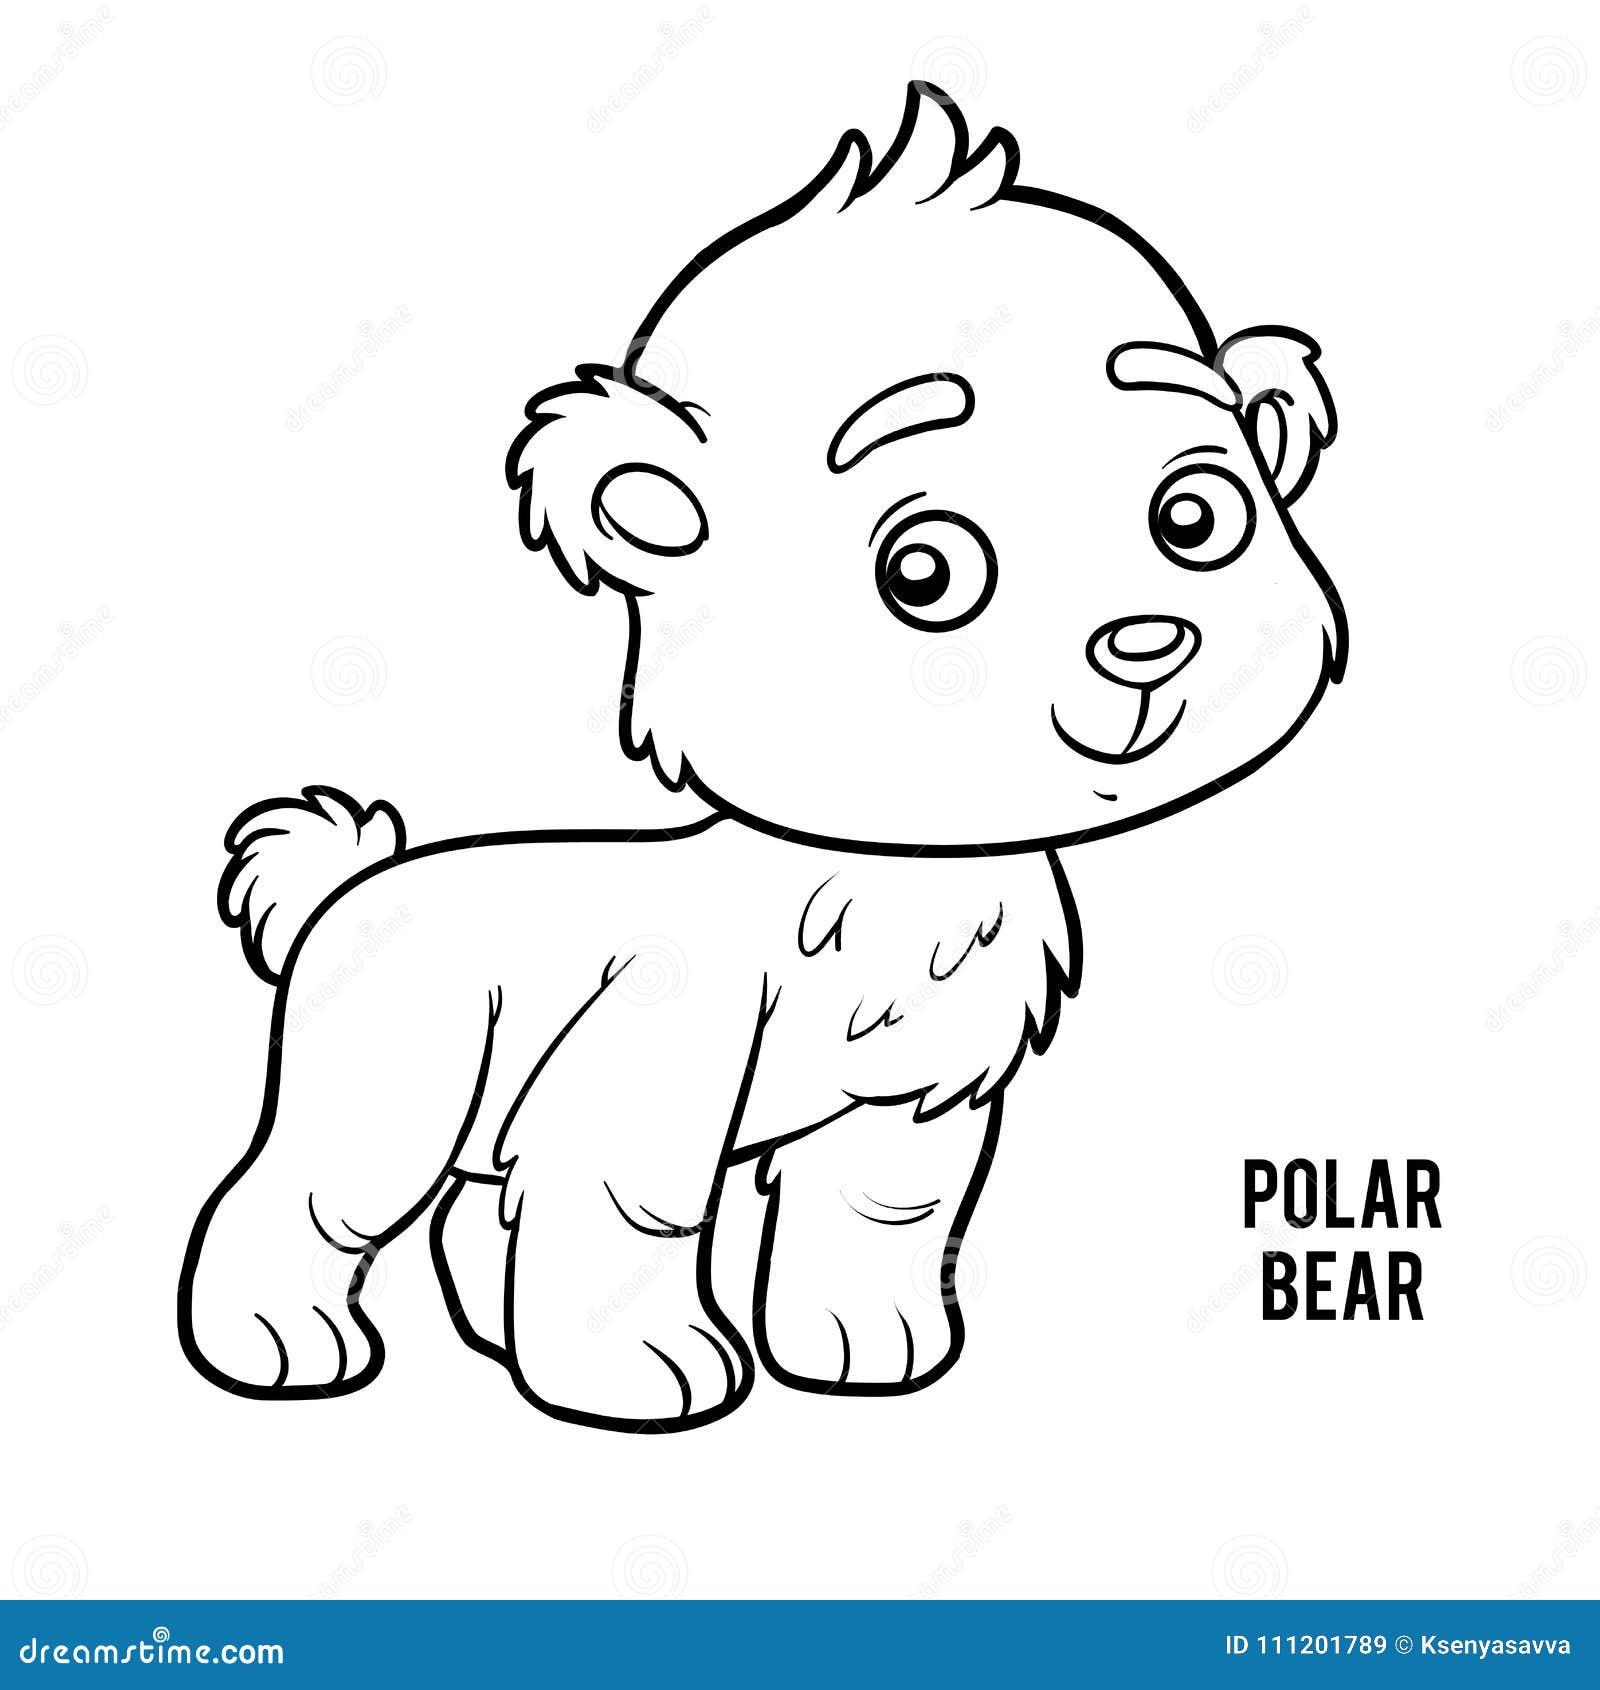 Coloring book, Polar bear stock vector. Illustration of game - 111201789